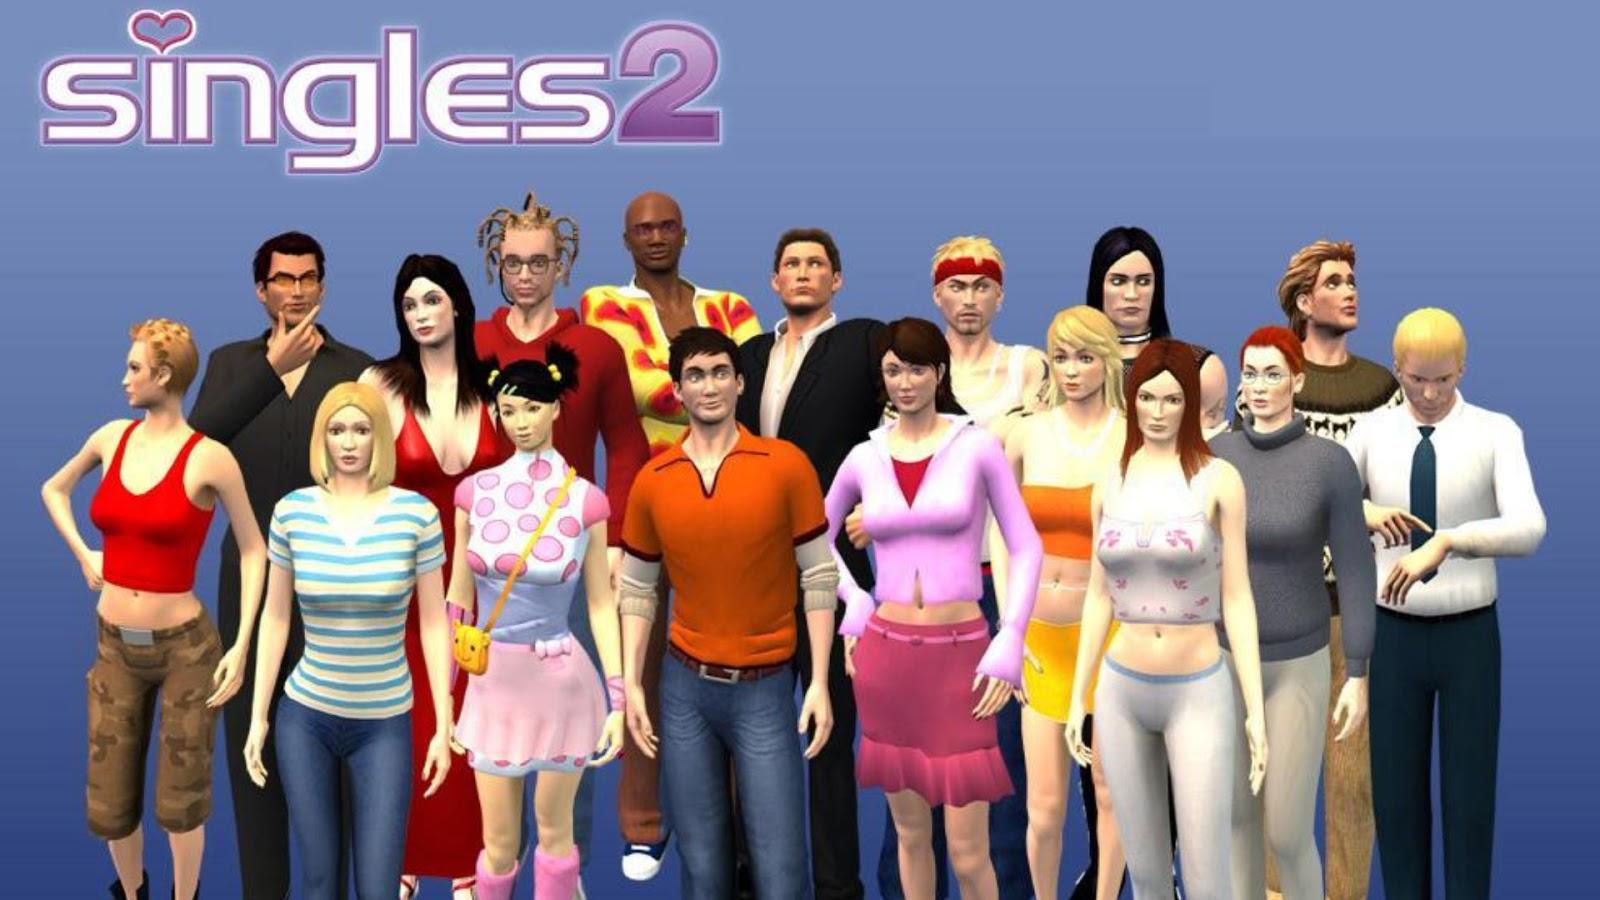 Singles 2 spiel kostenlos downloaden